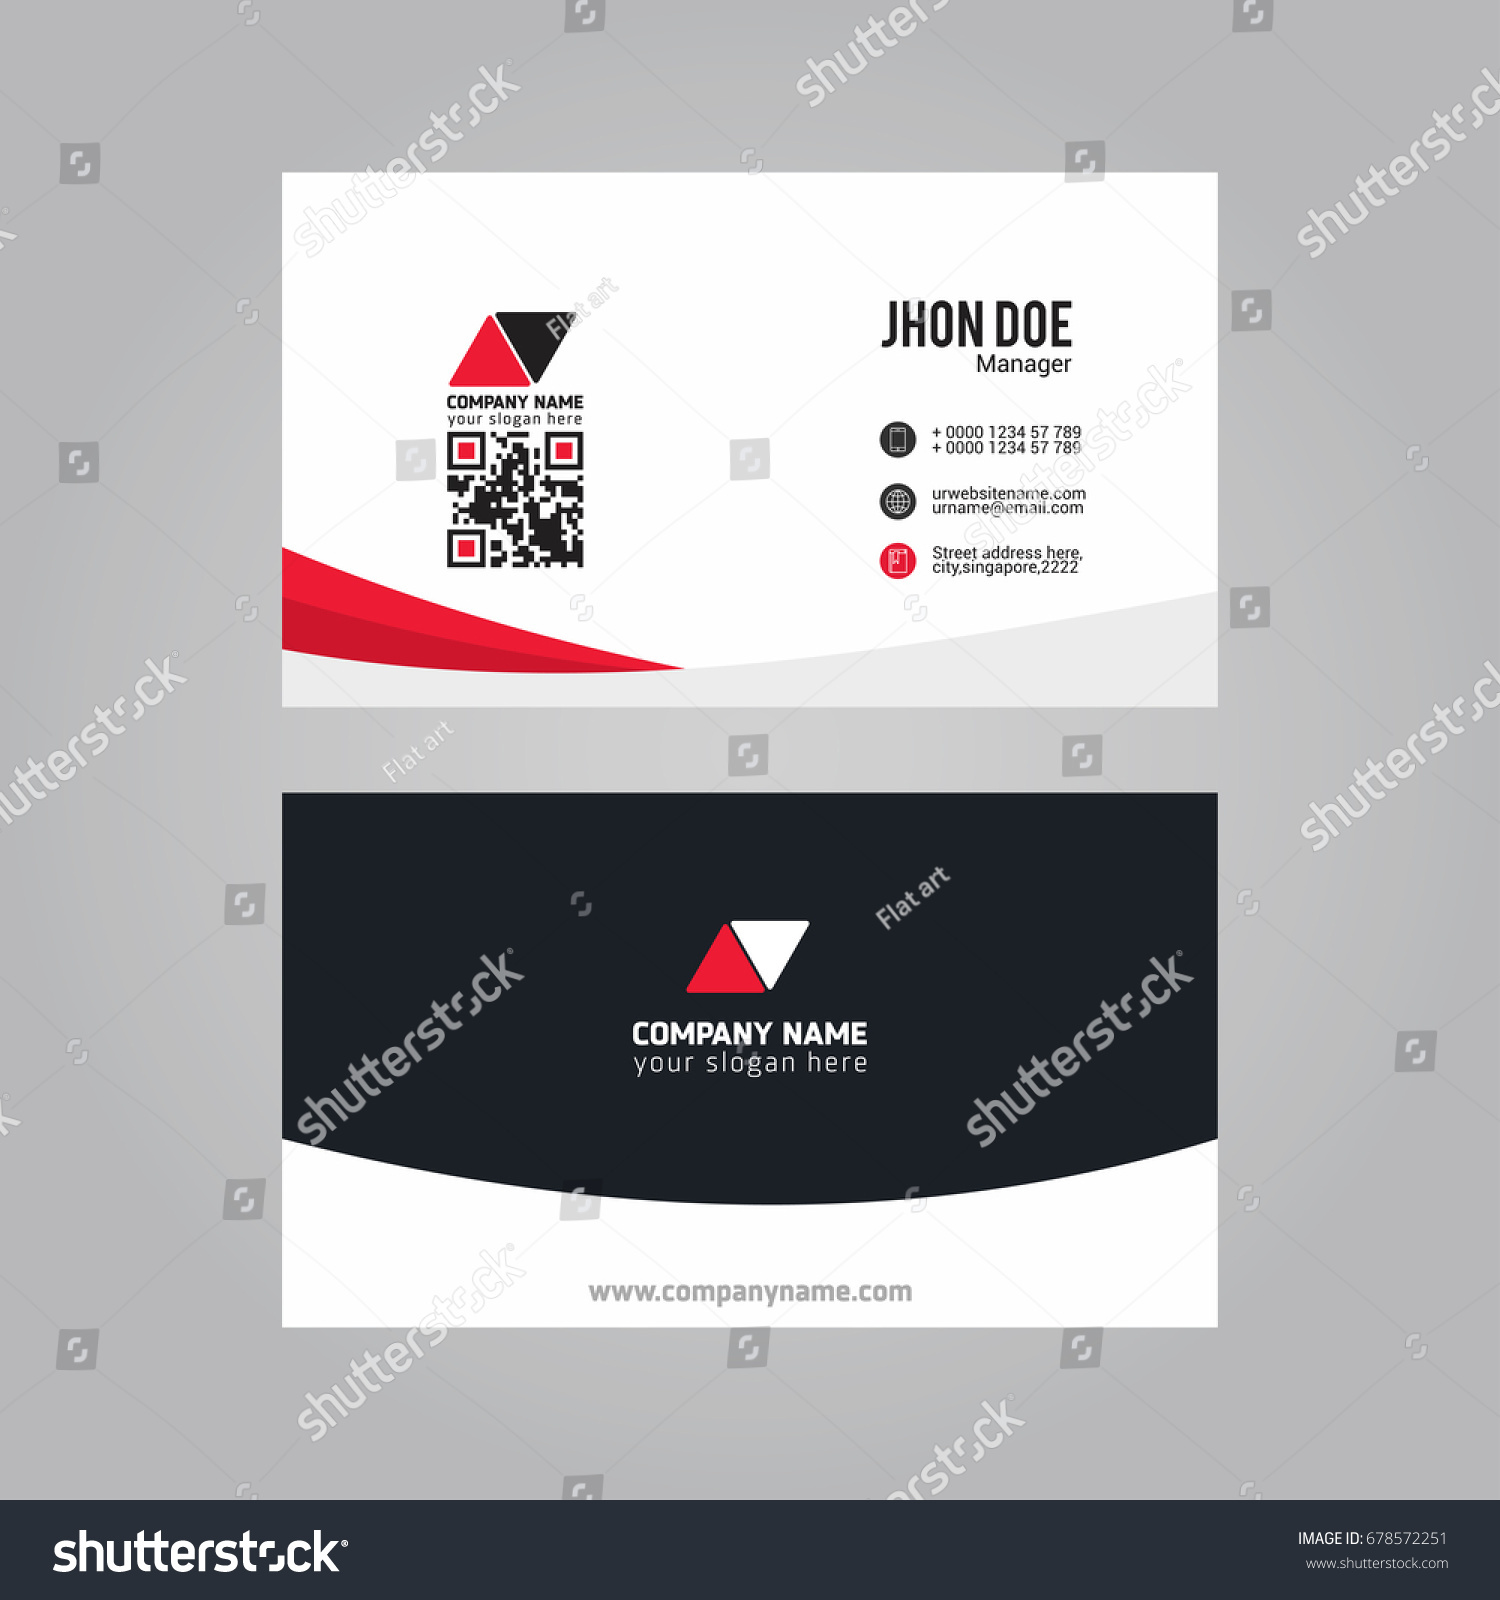 Cute Qr Code On Business Card Photos - Business Card Ideas ...